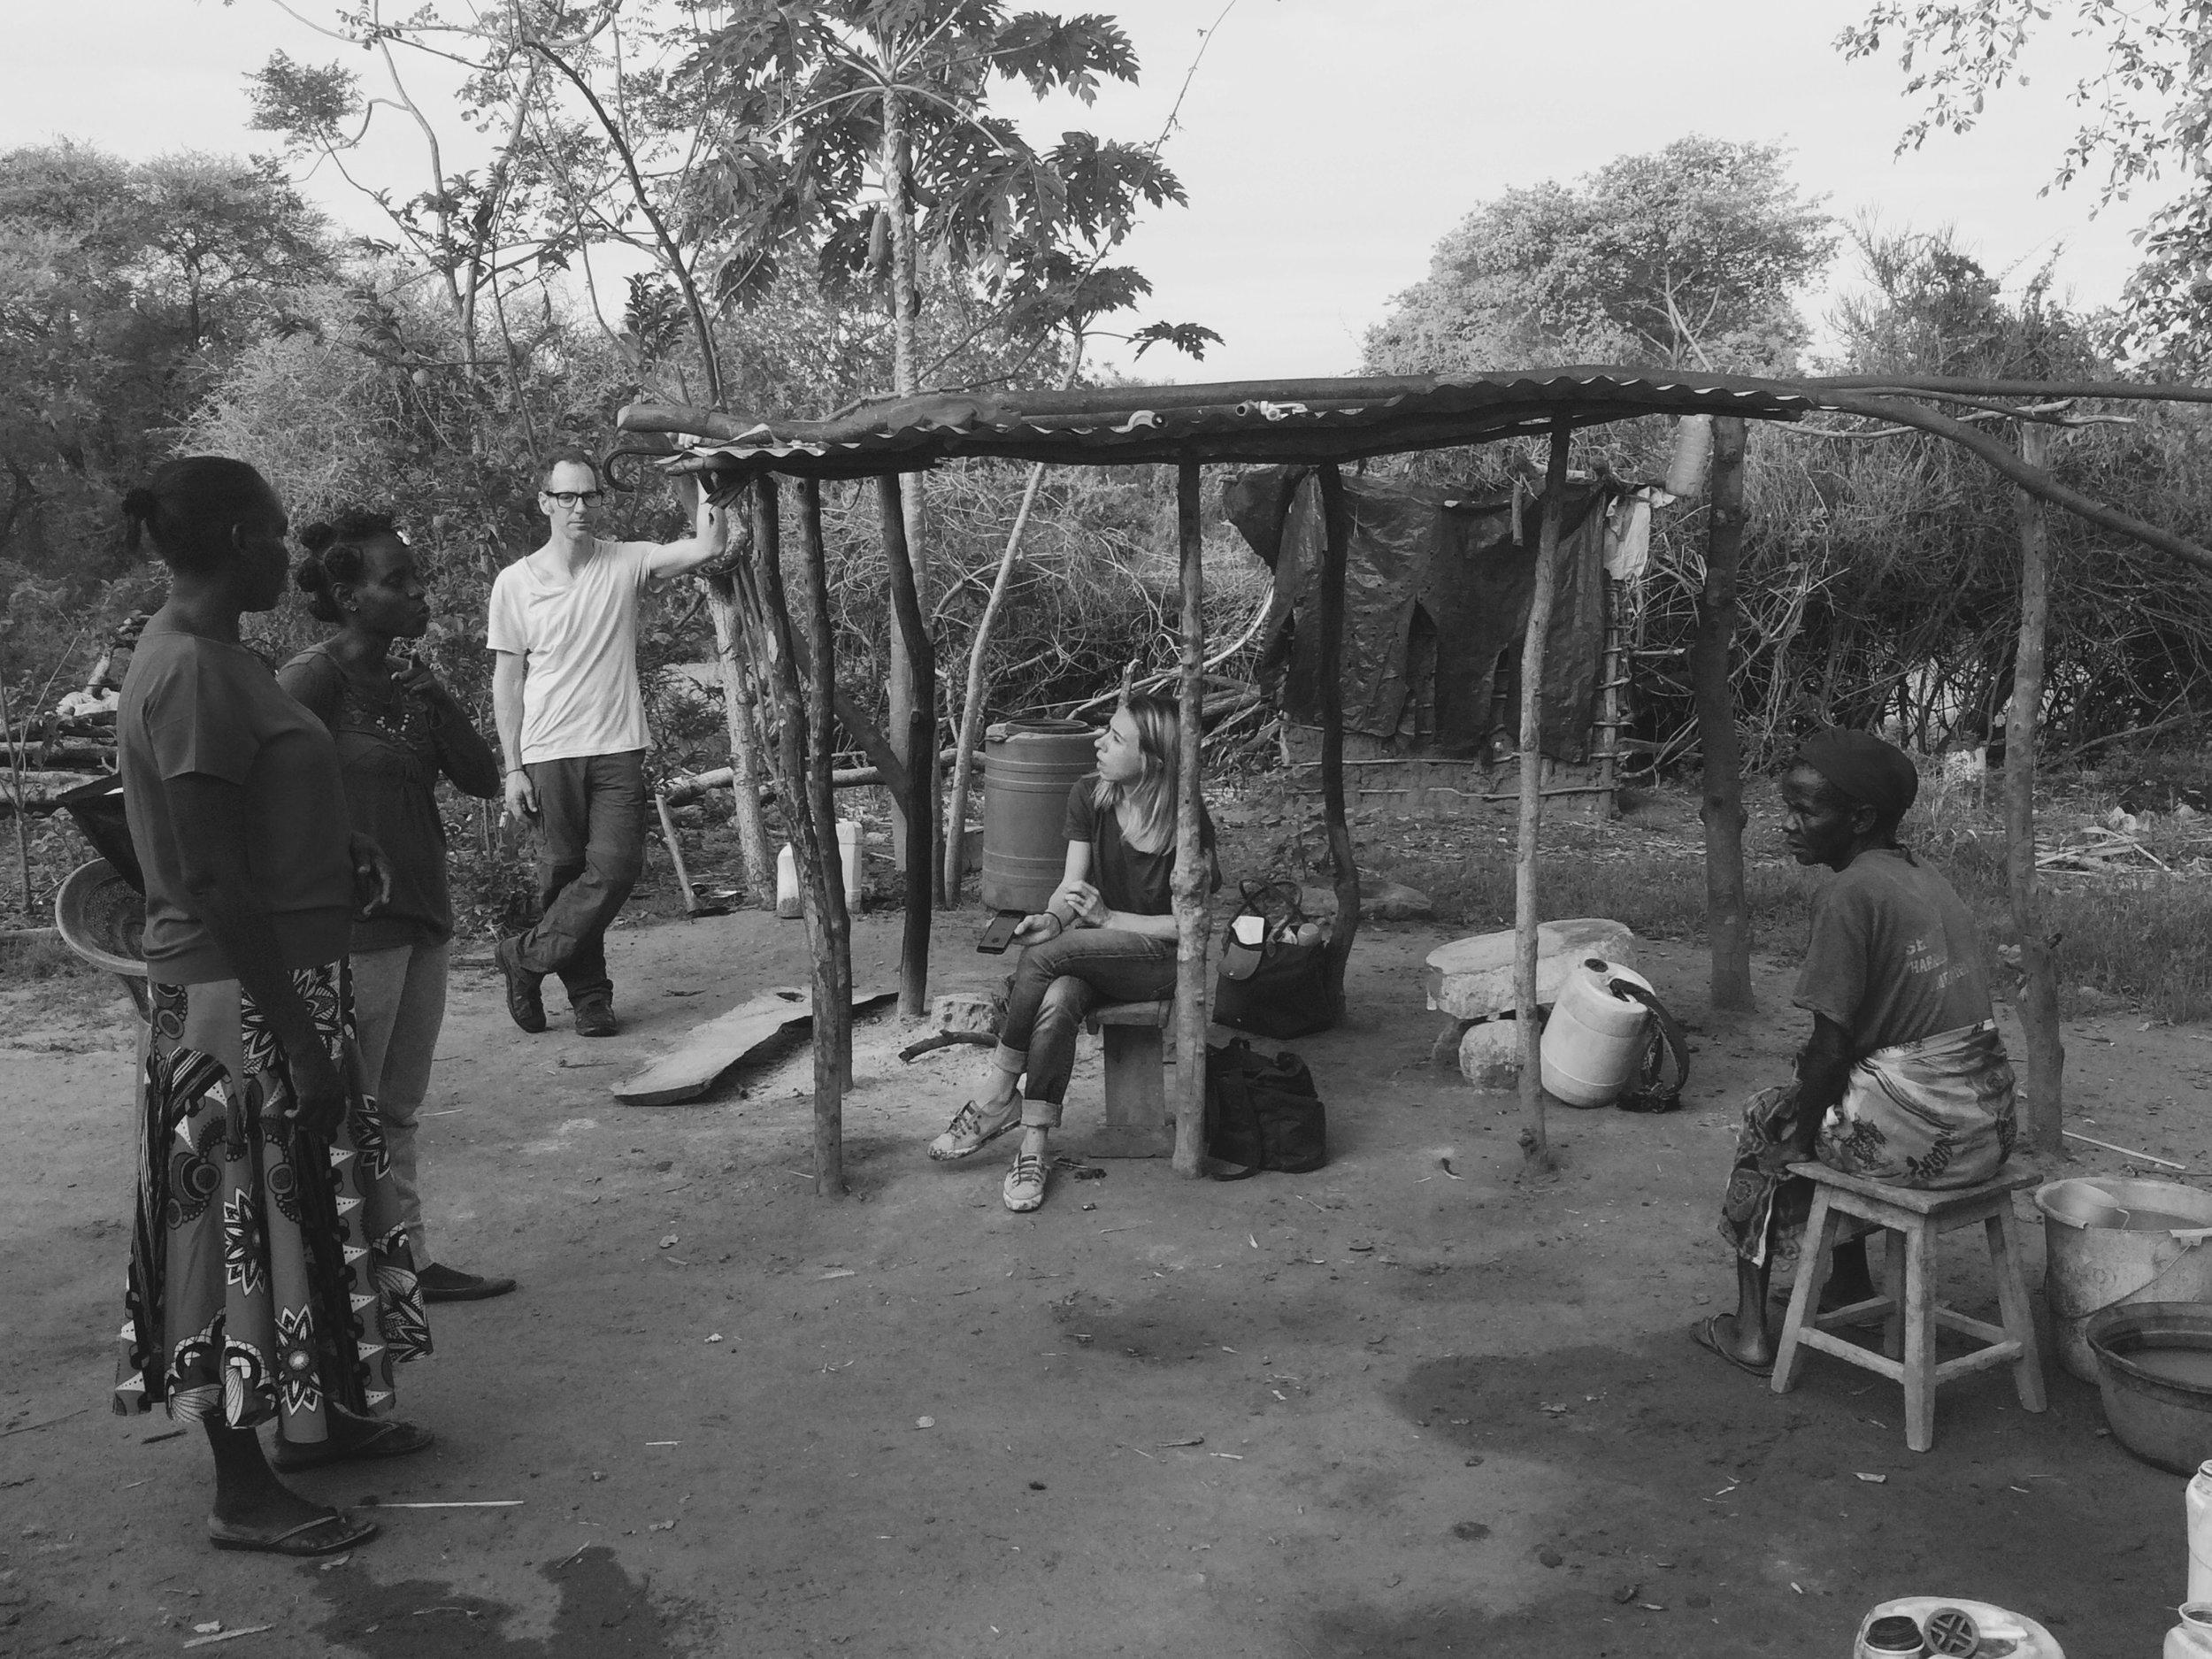 181209_OF-Kenya_BTS 1.jpg